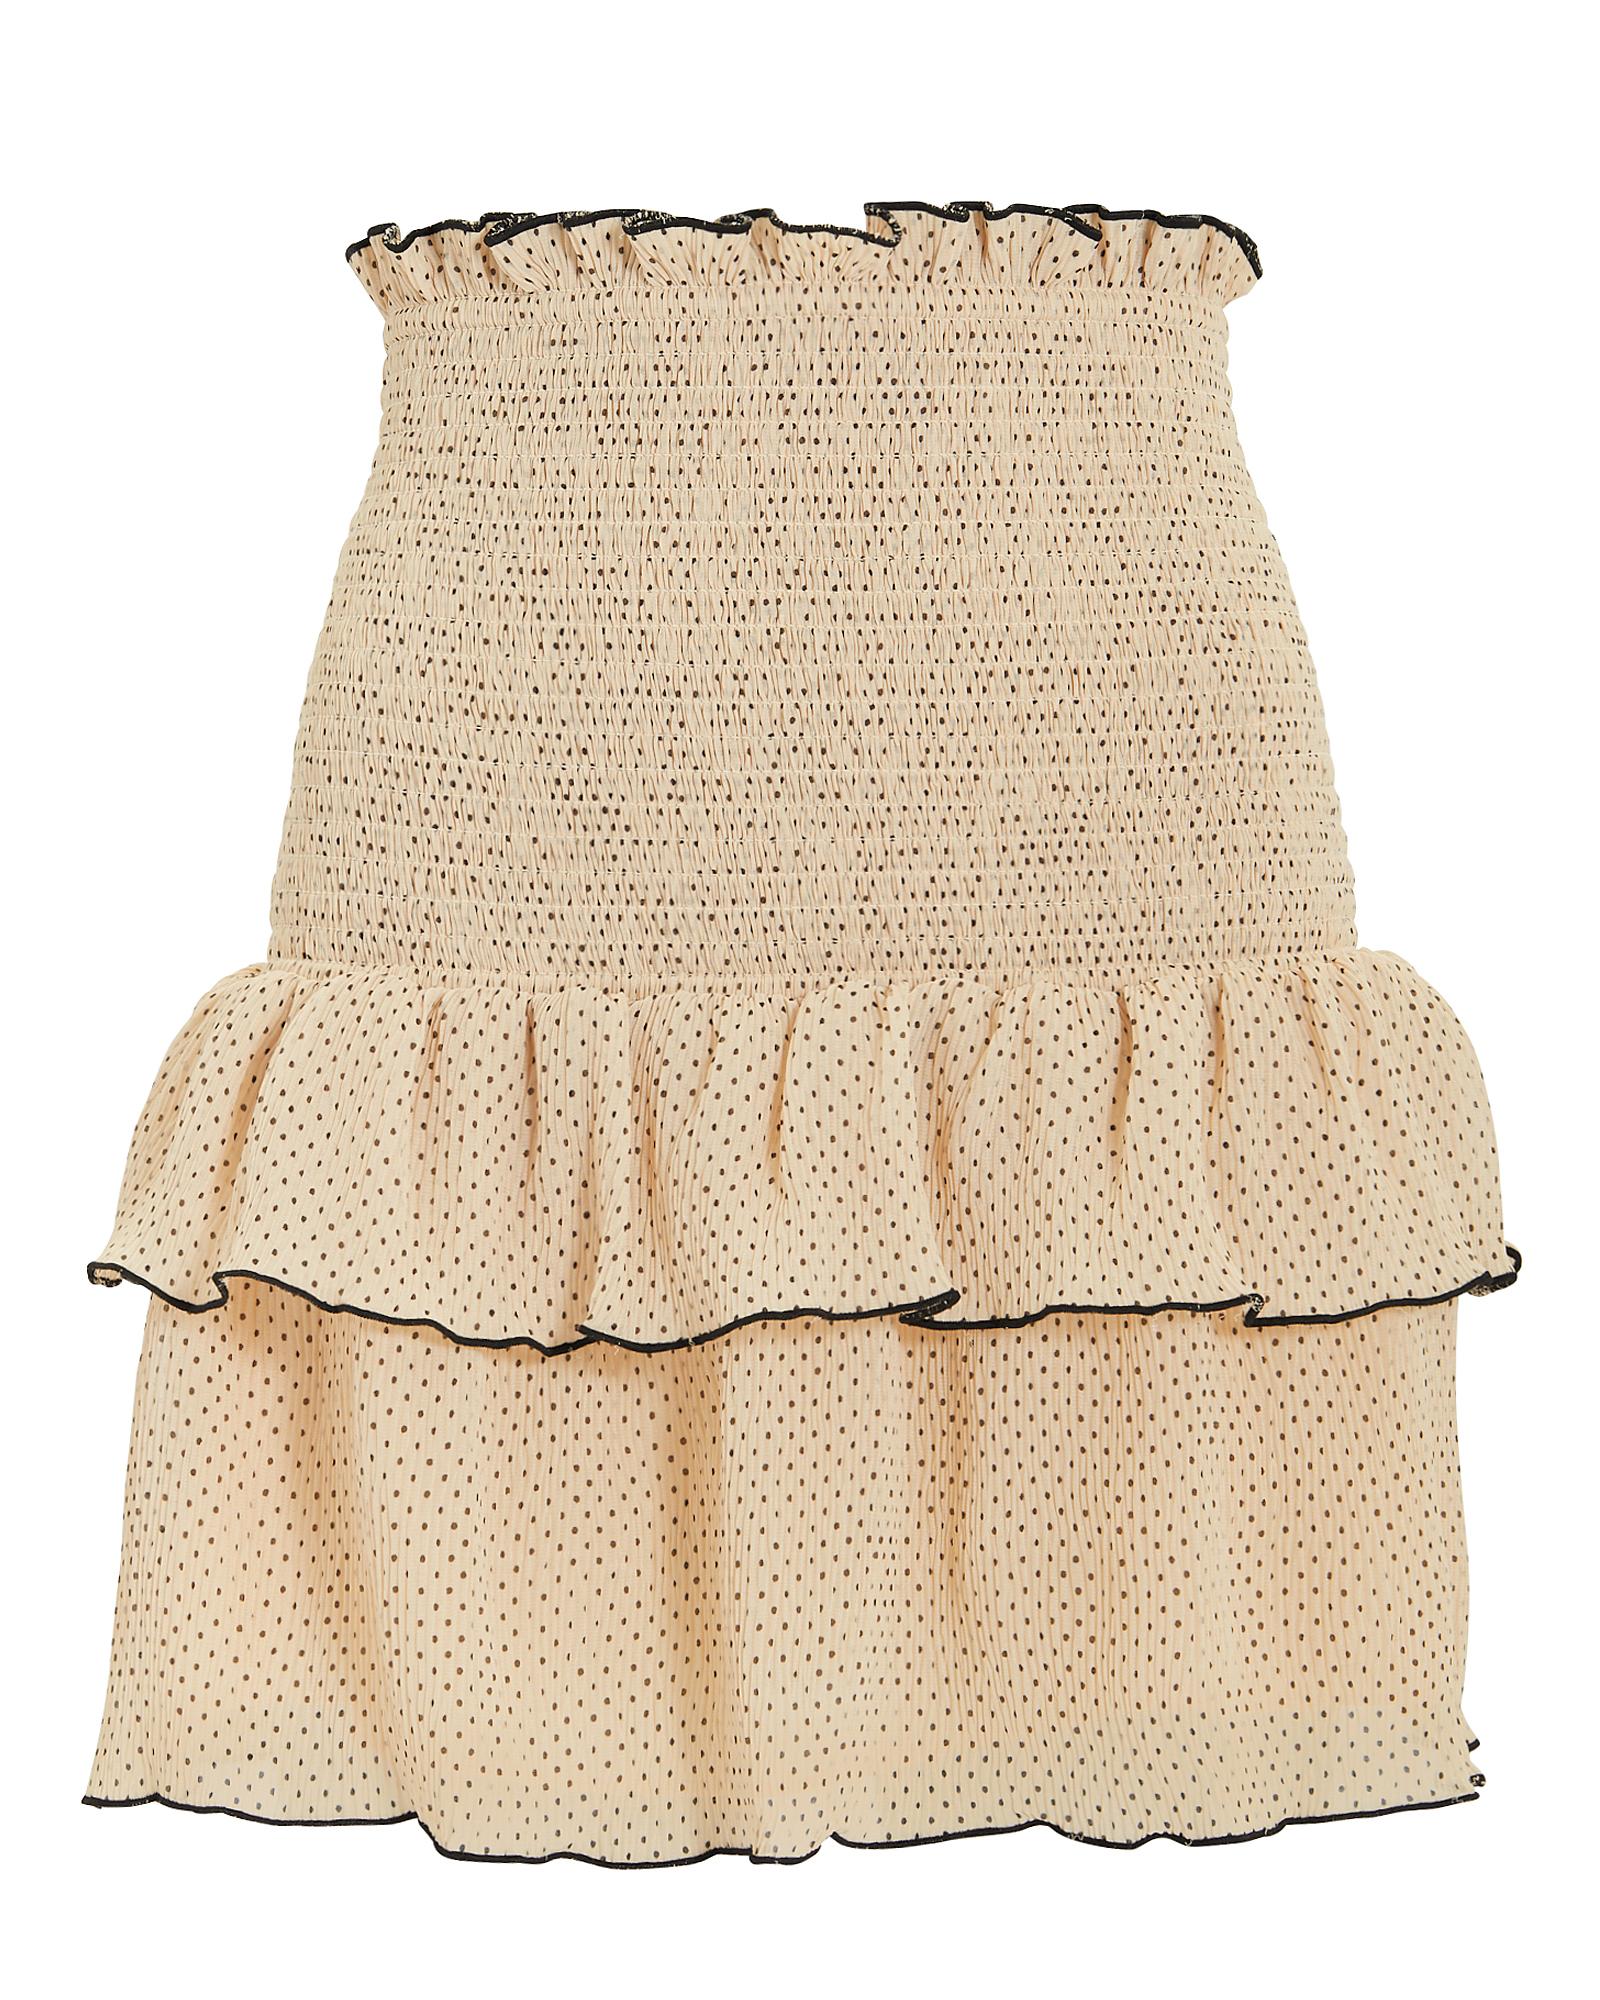 Chloe Ruffle Mini Skirt